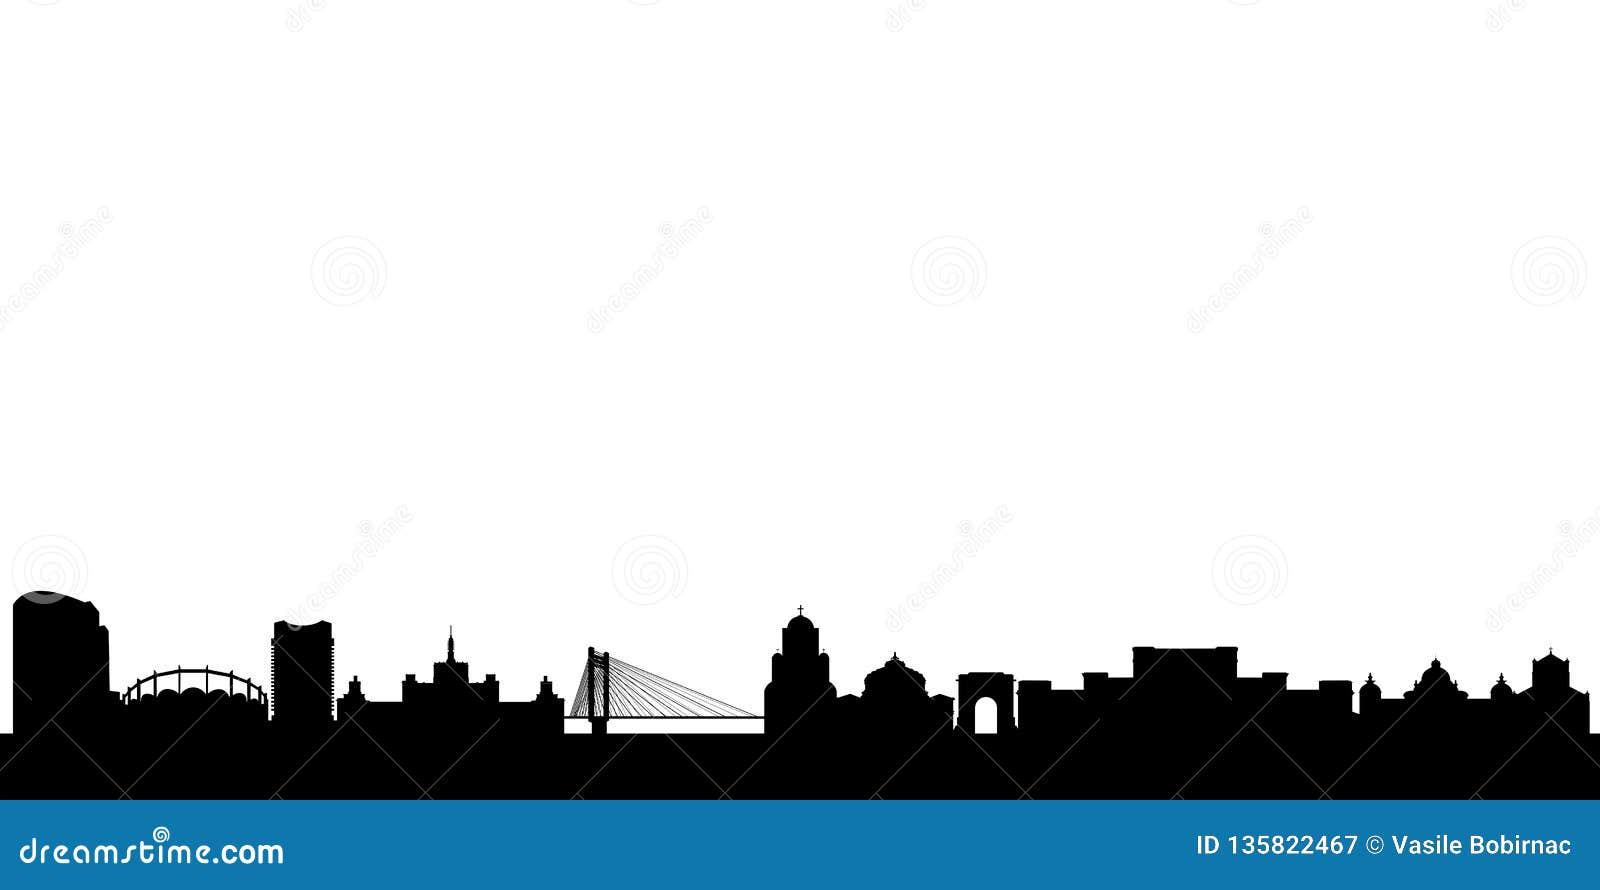 Bucharest Skyline with Monuments